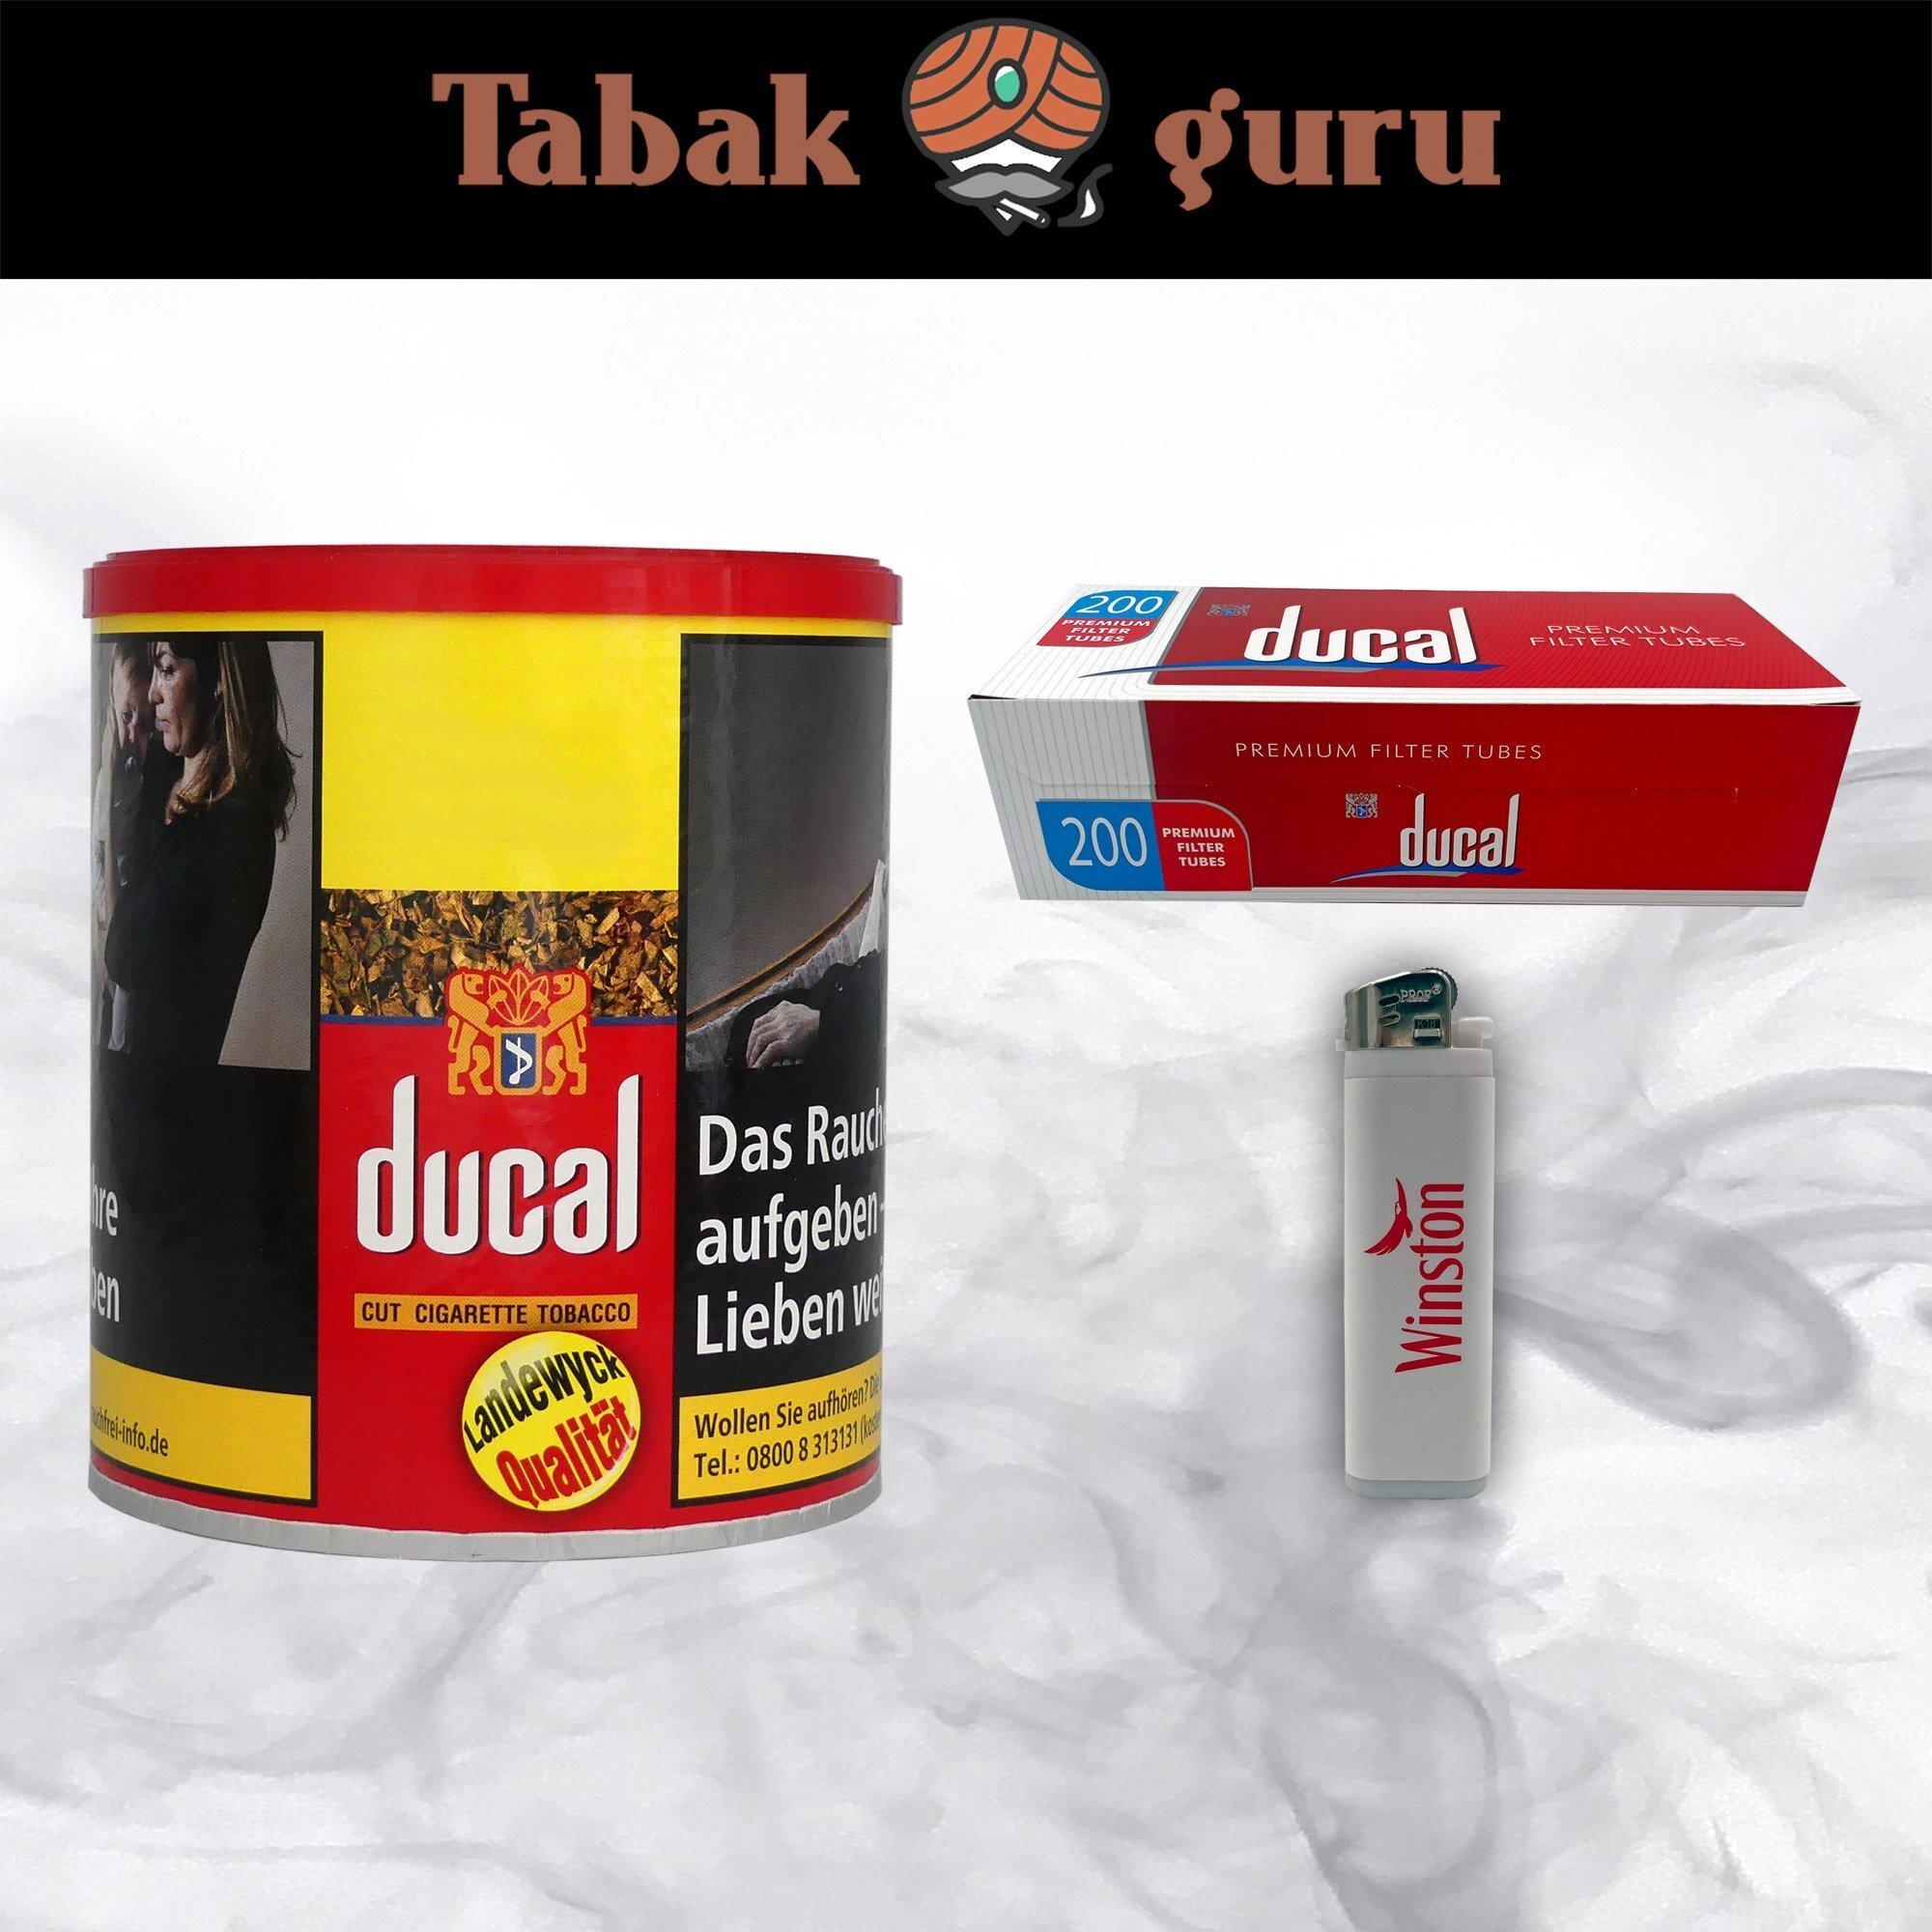 Ducal Cut Tobacco Zigarettentabak 63g Dose + ducal Hülsen + Feuerzeug